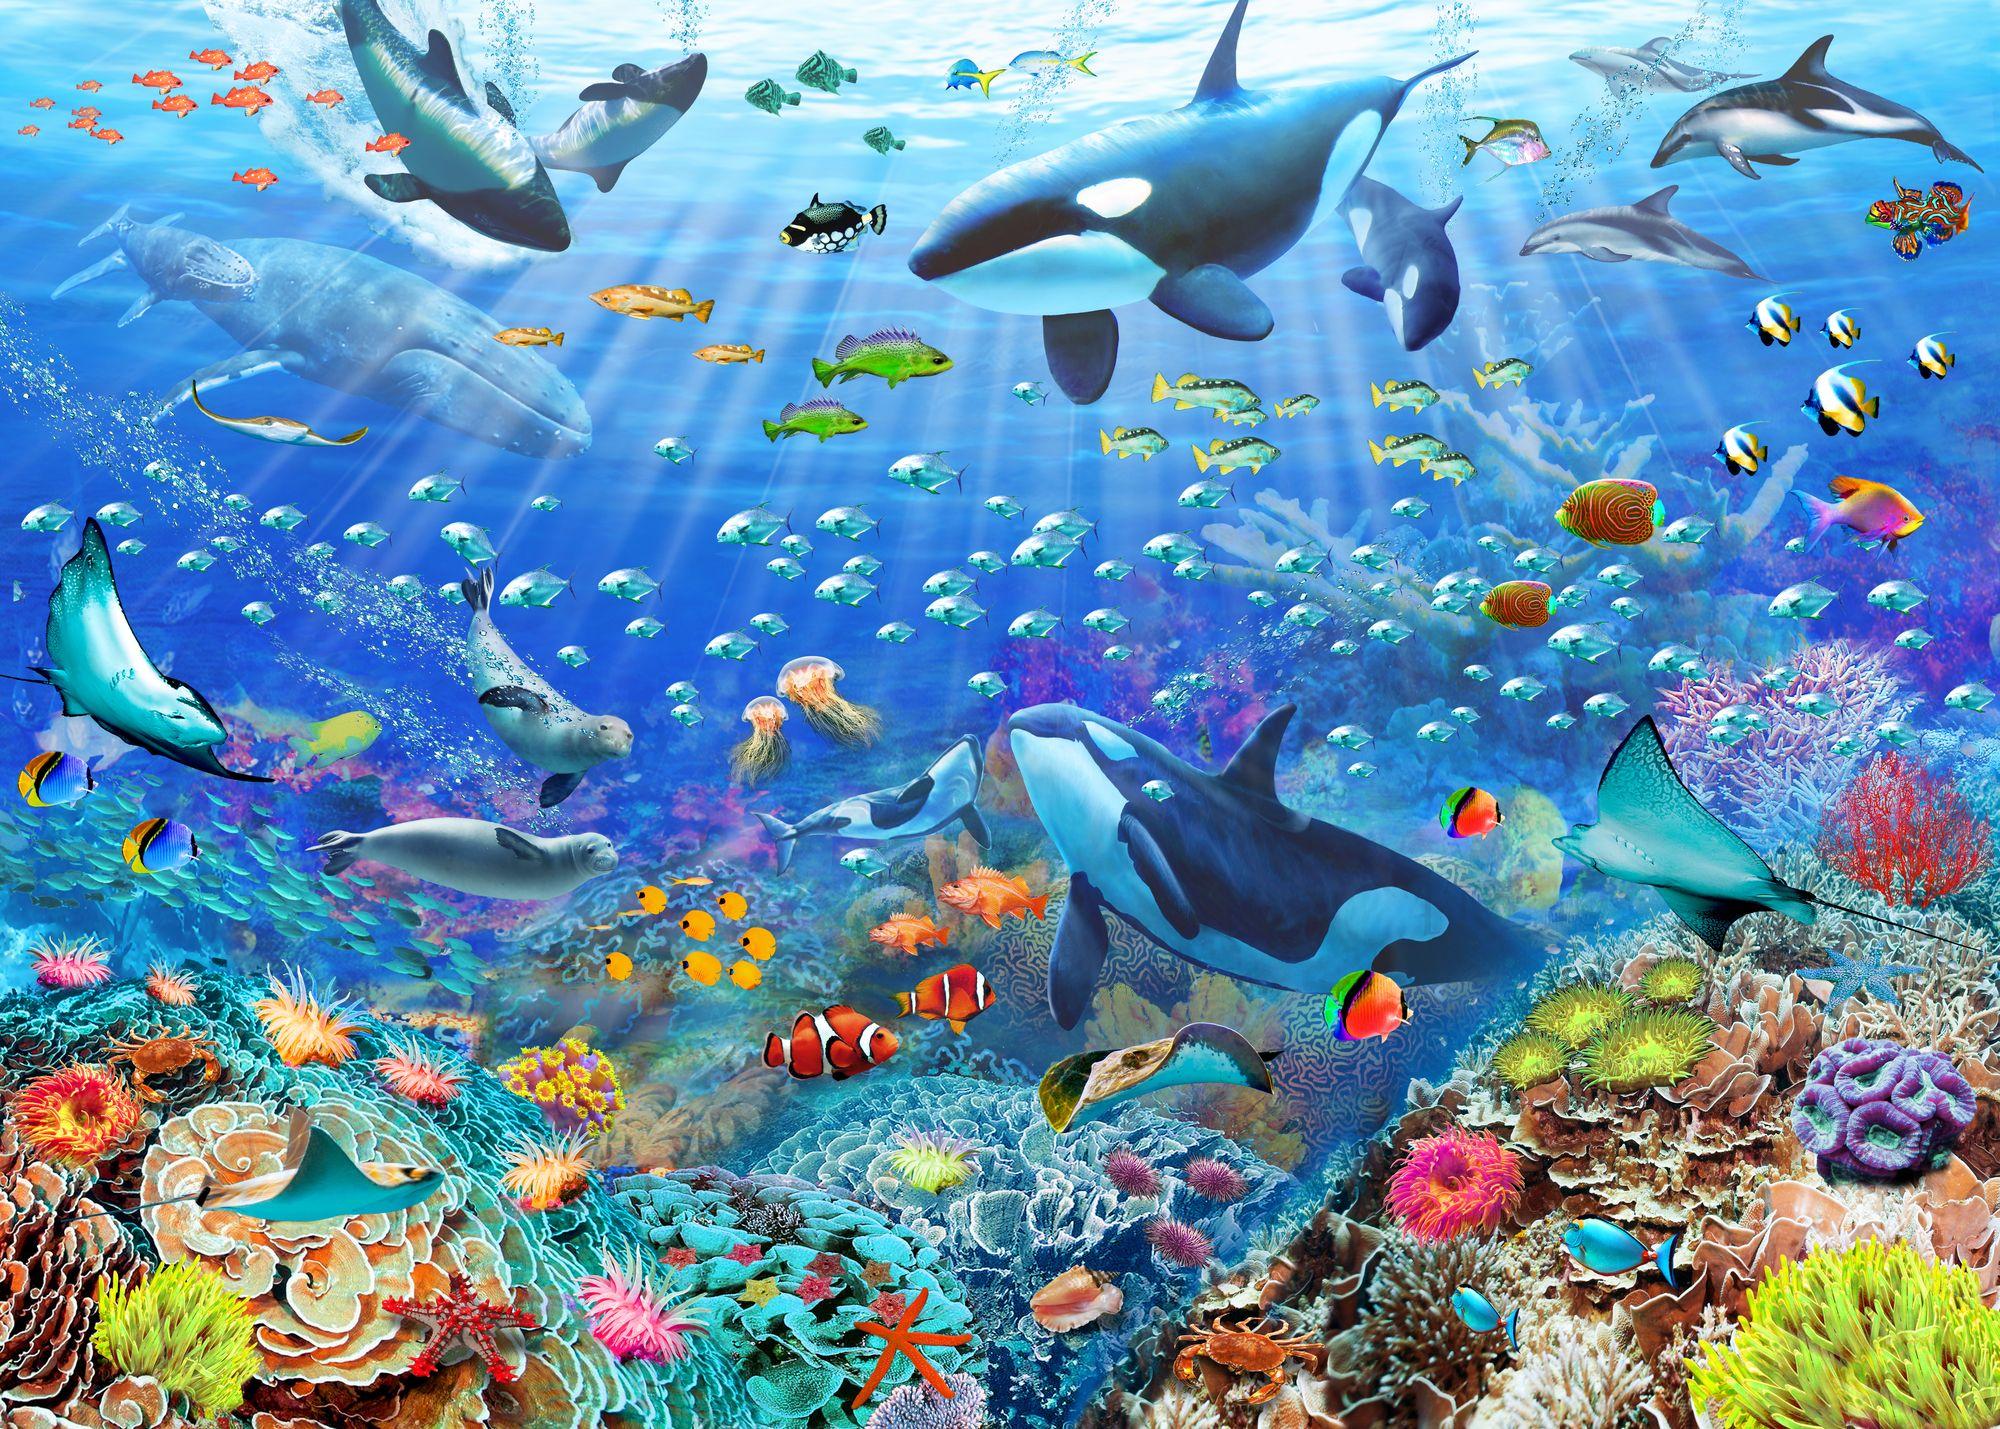 Underwater Scenery Mural, Scenery wallpaper, Wall murals